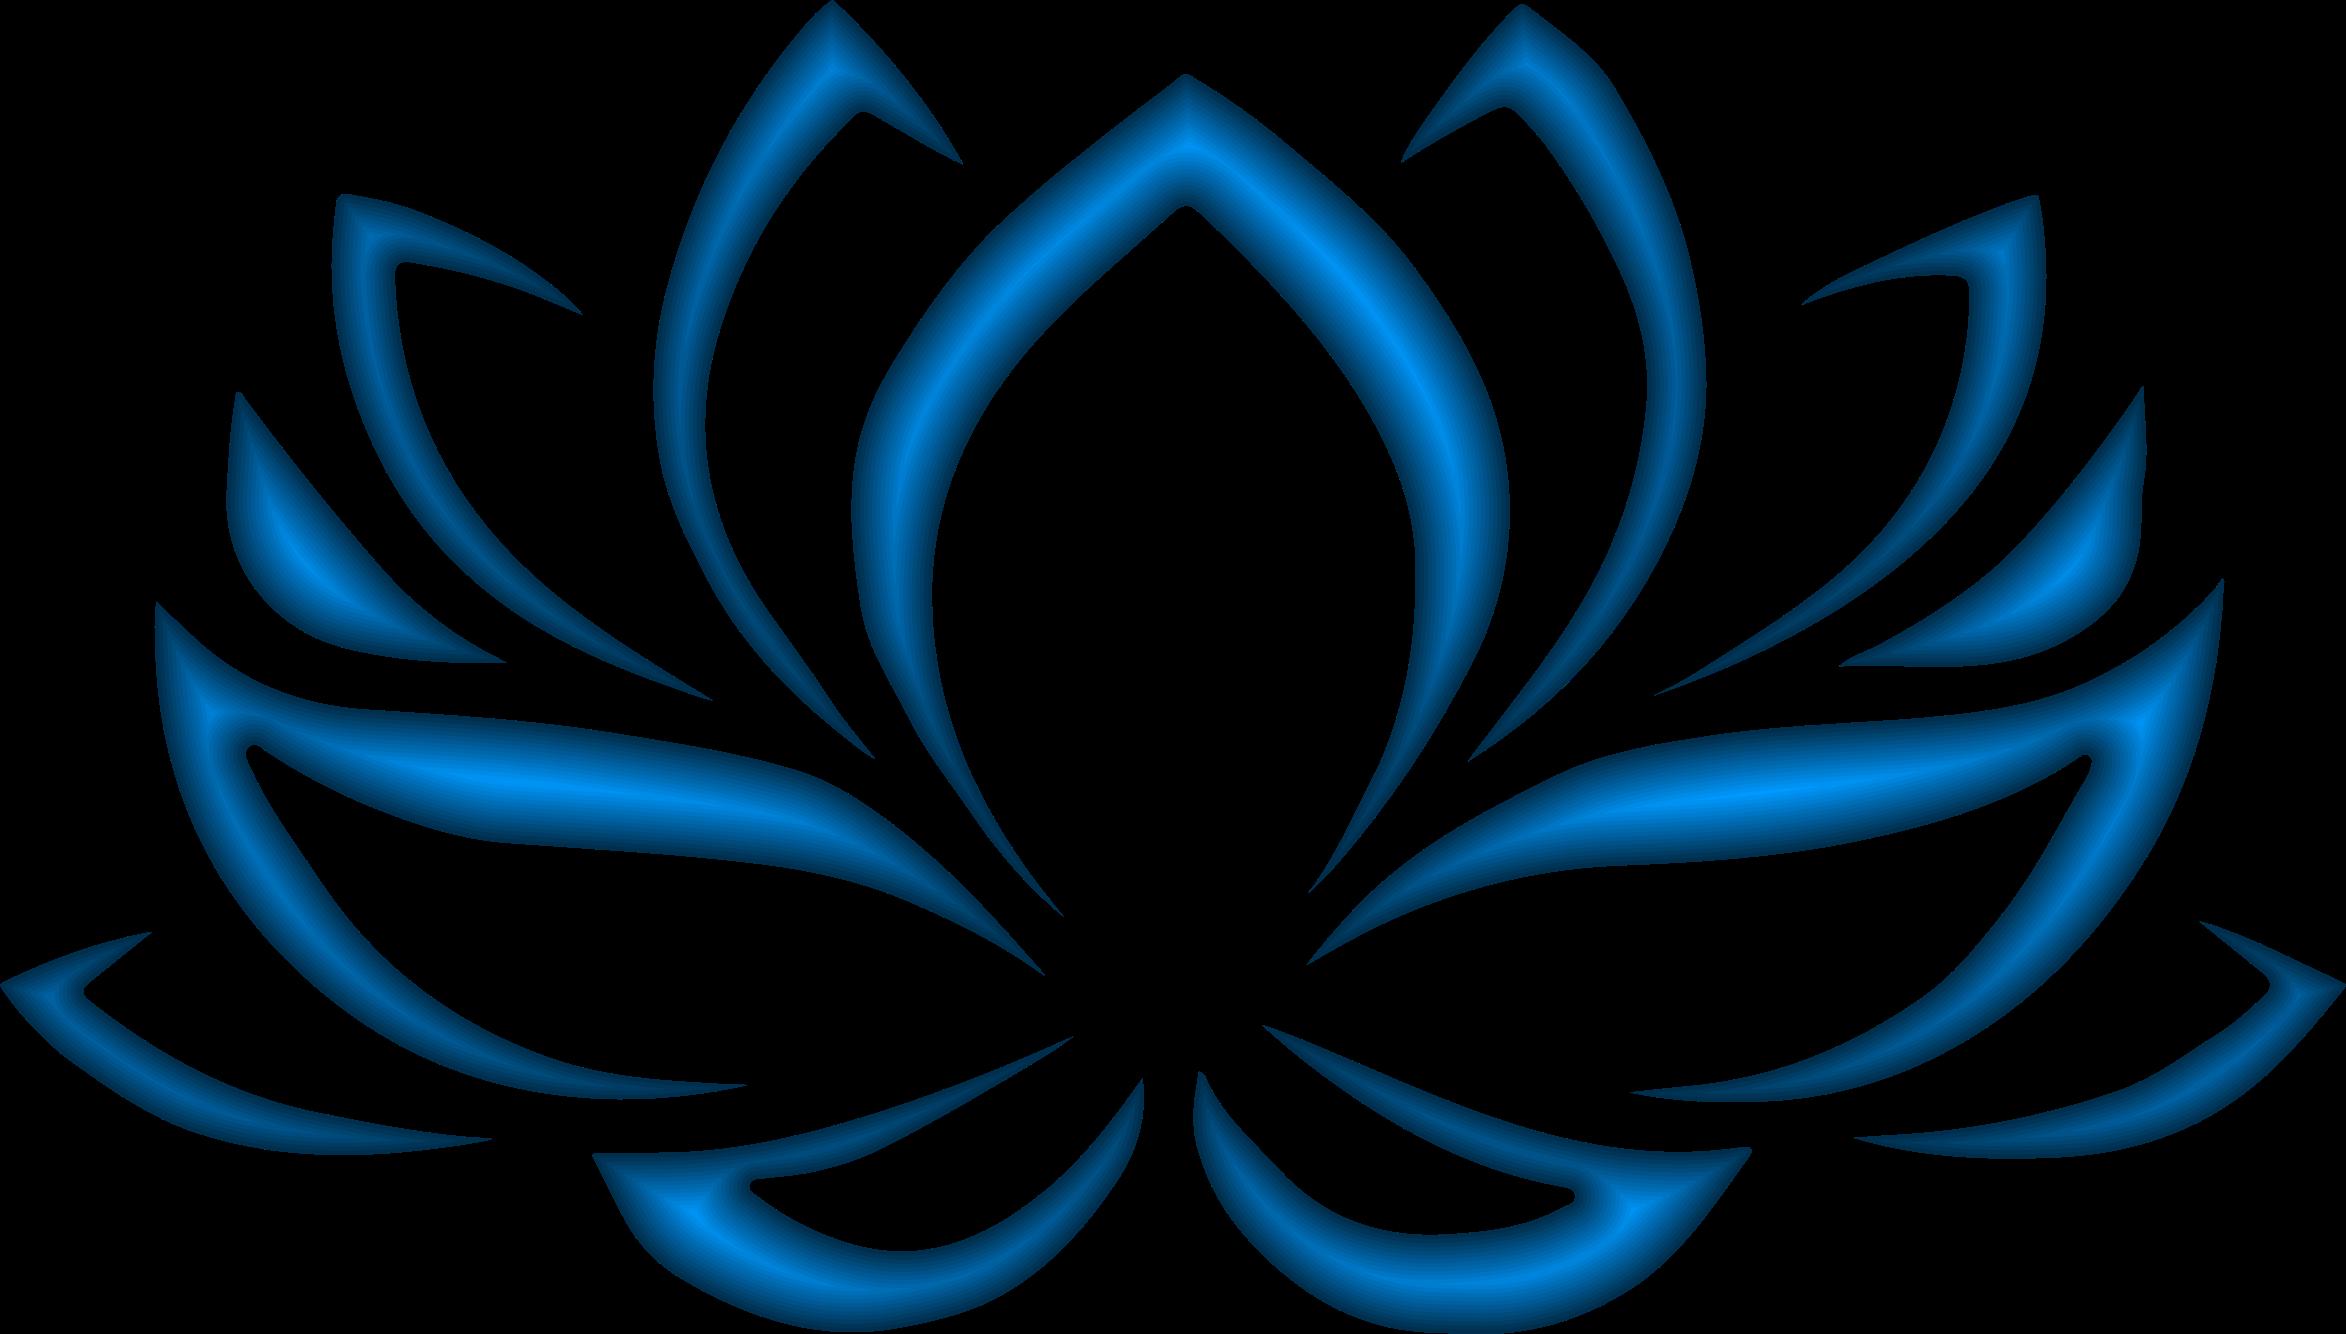 Lotus clipart blue lotus. Indigo flower